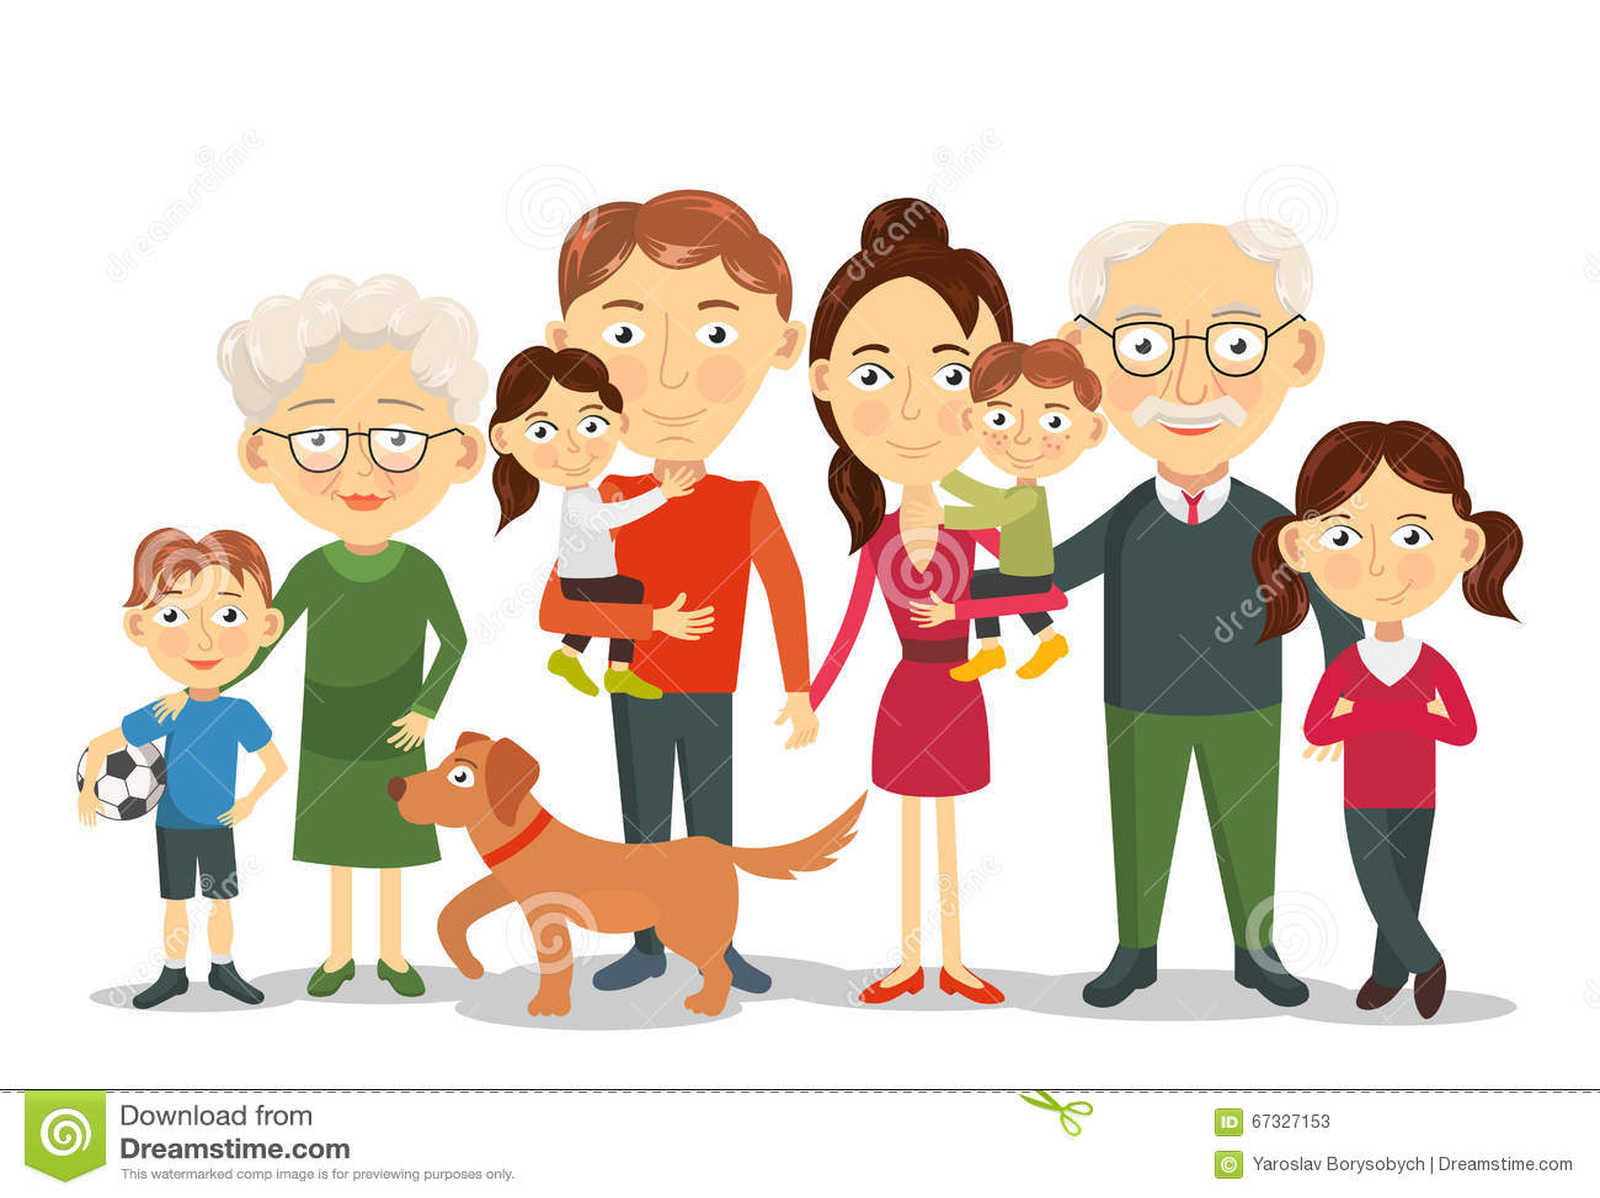 Big and happy family portrait with children, parents, grandparents vector